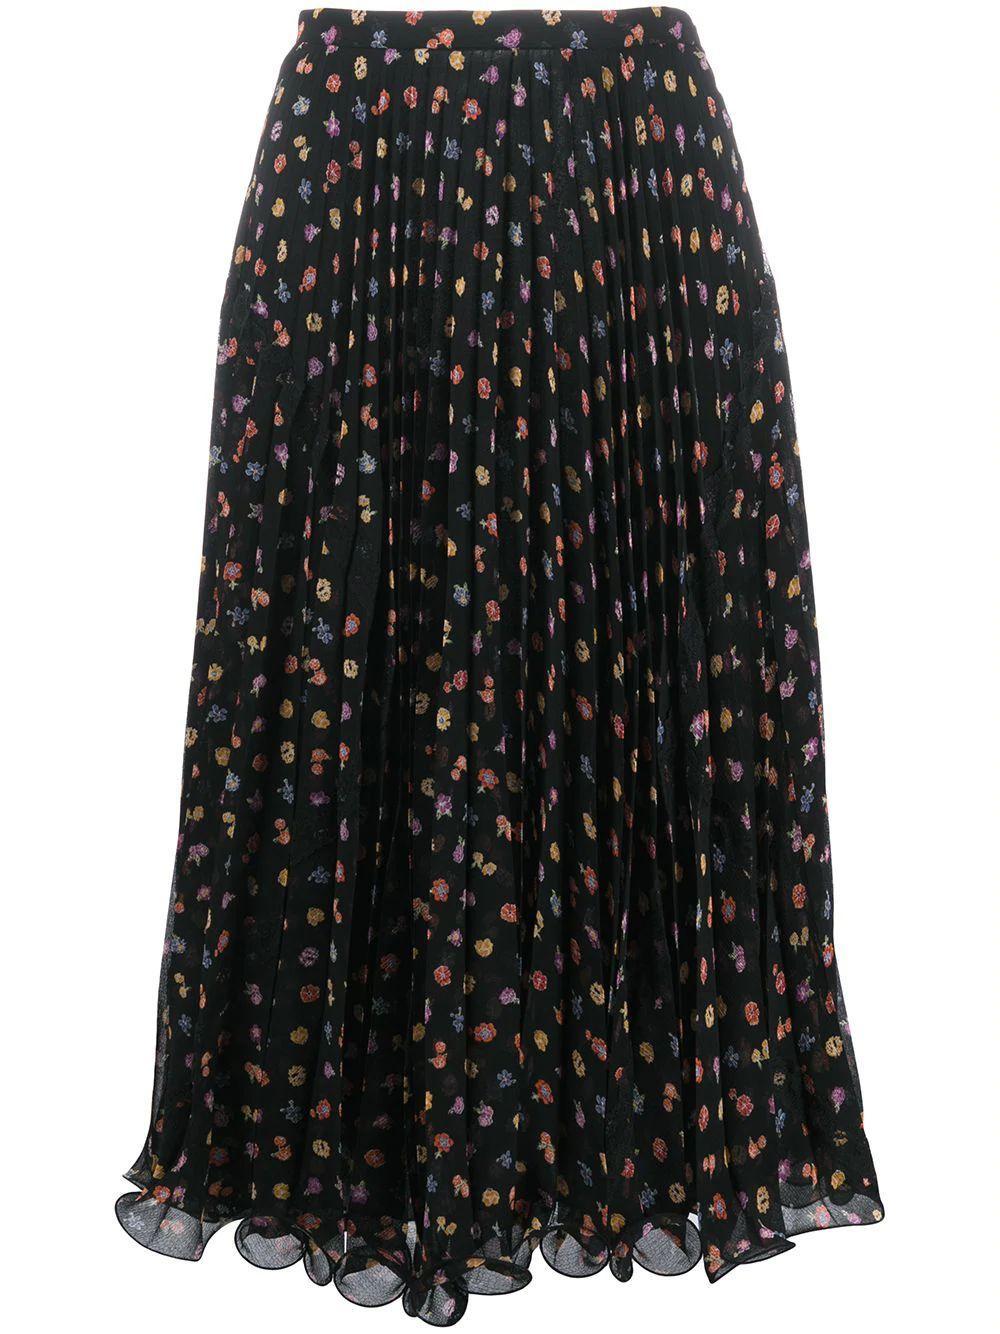 Floral Printed Midi Skirt